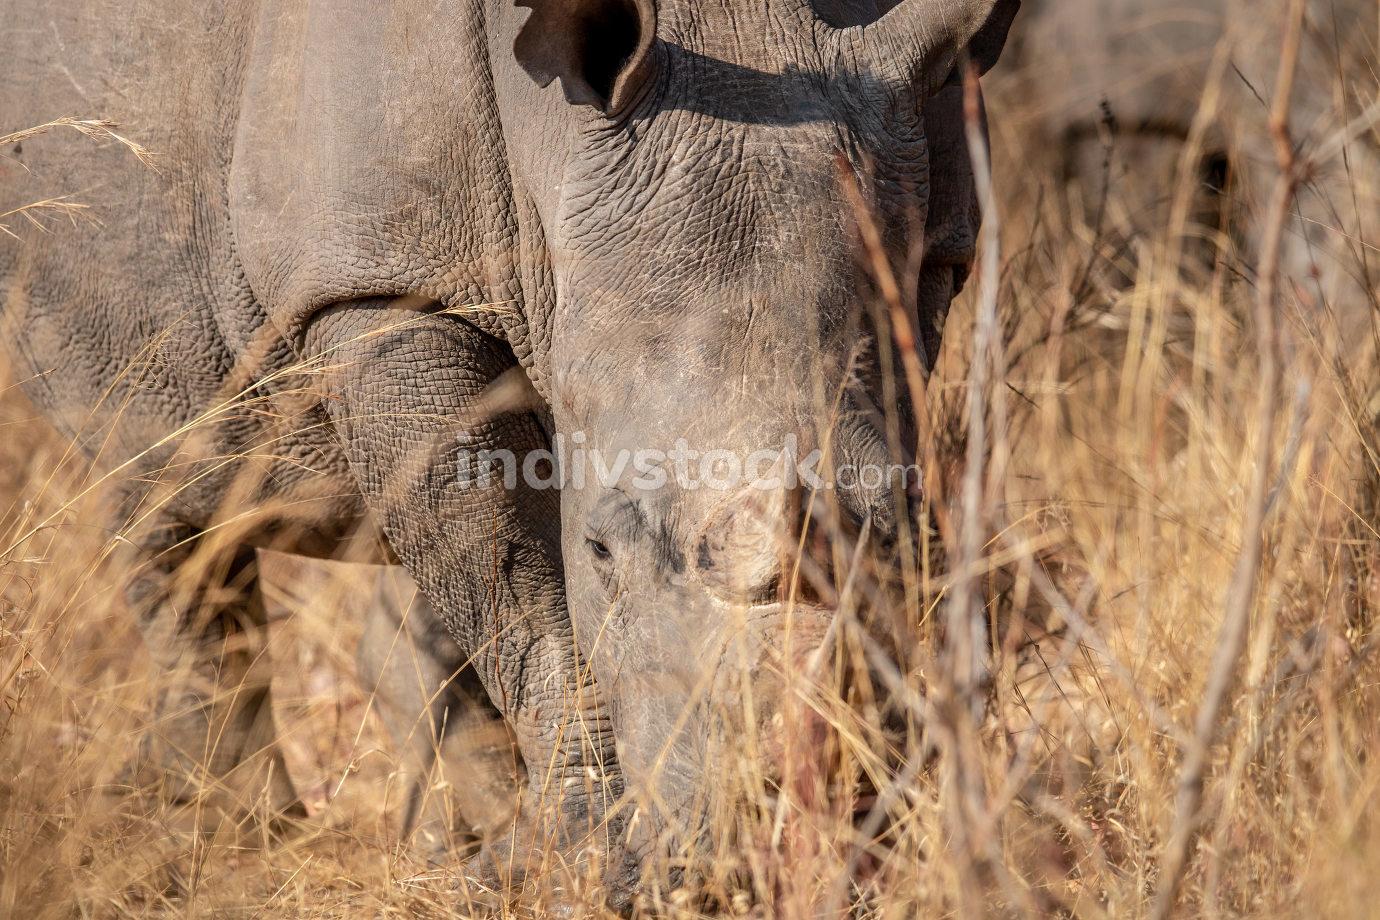 Big White rhino grazing in the high grass.